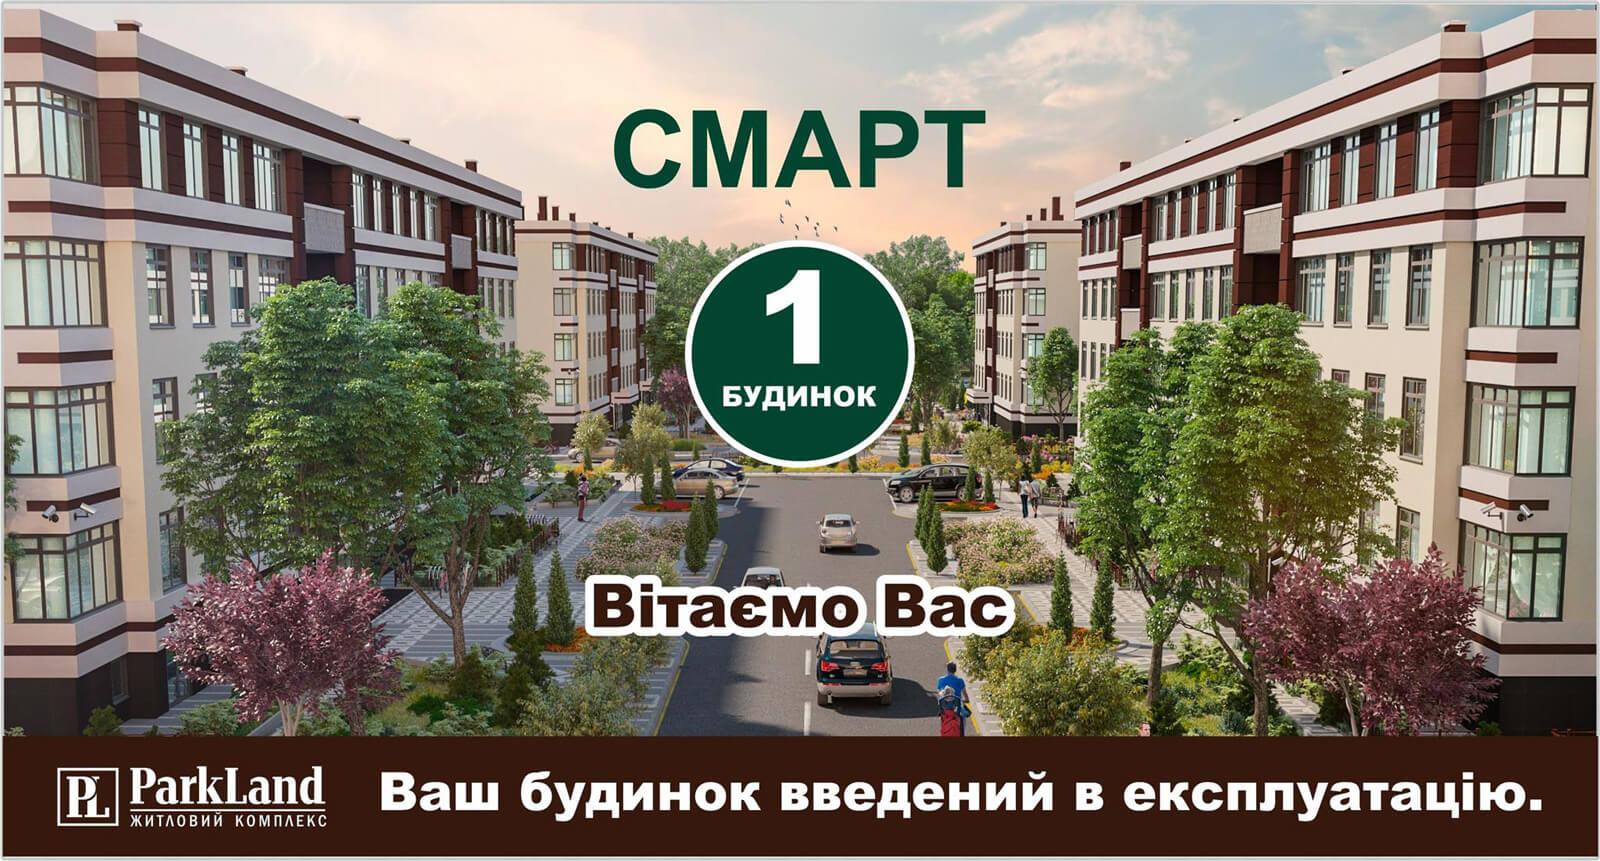 news-smart-1110618-ukr